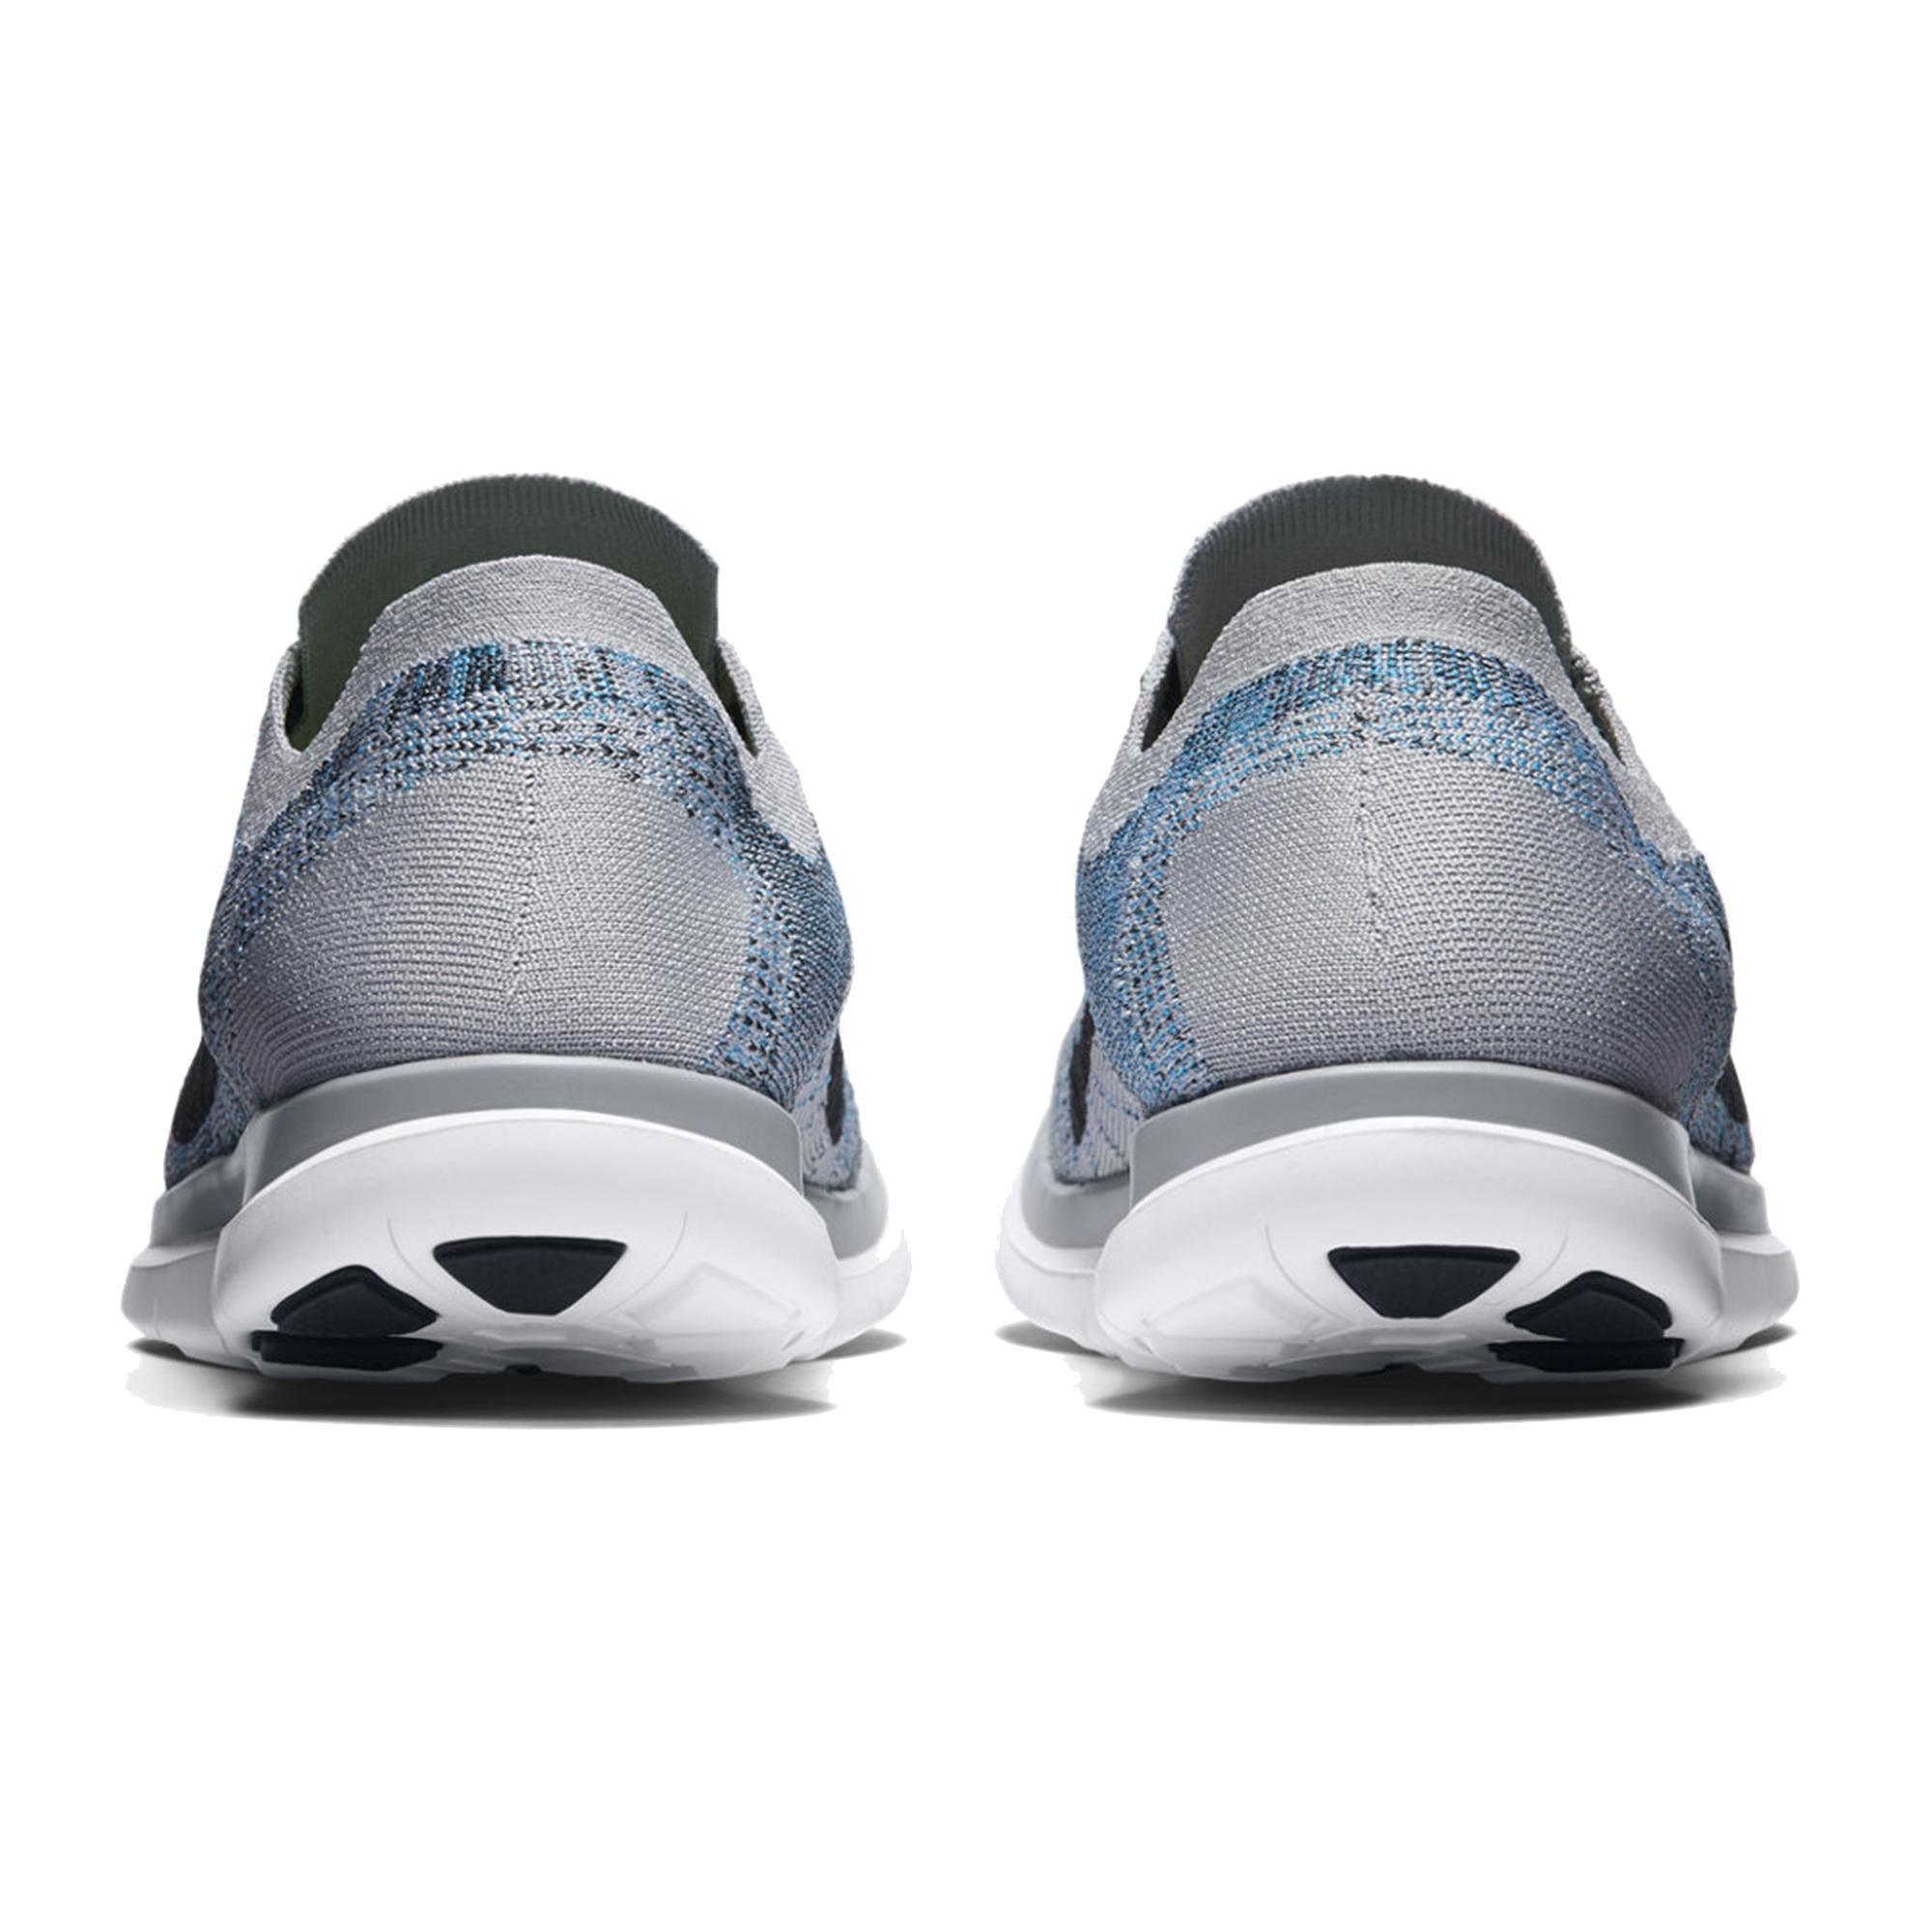 6765fb6fa63e Nike Free 4.0 Flyknit Erkek Spor Ayakkabı